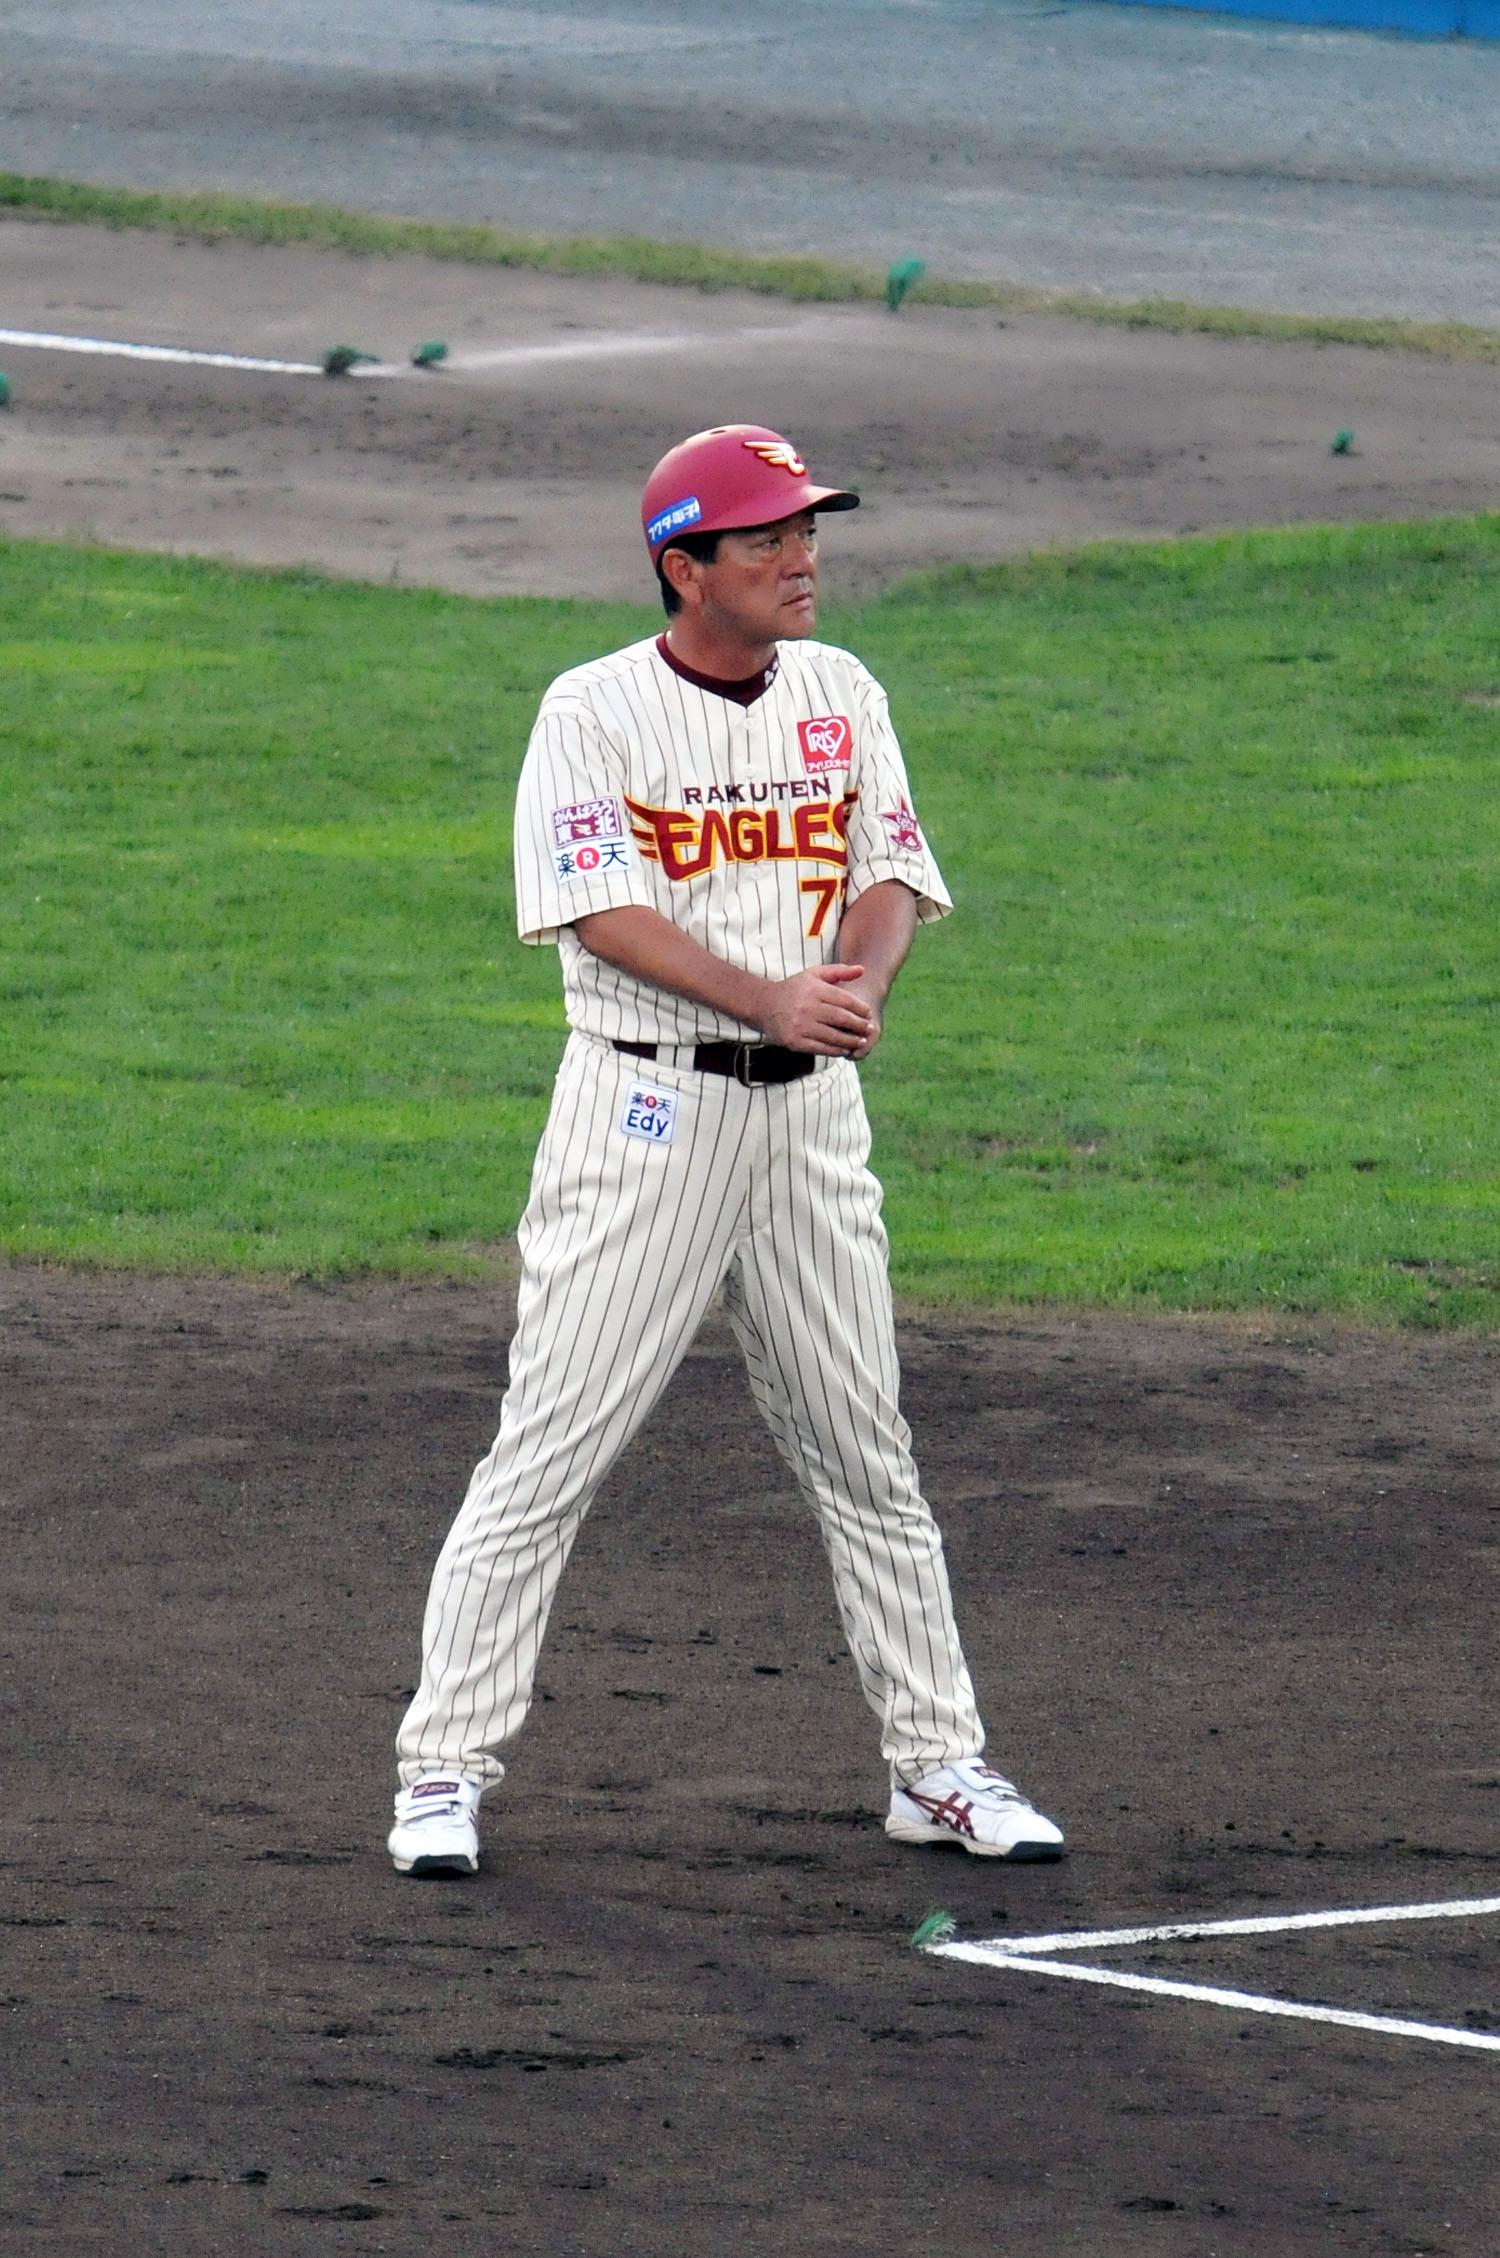 鈴木康友 (野球)の画像 p1_6